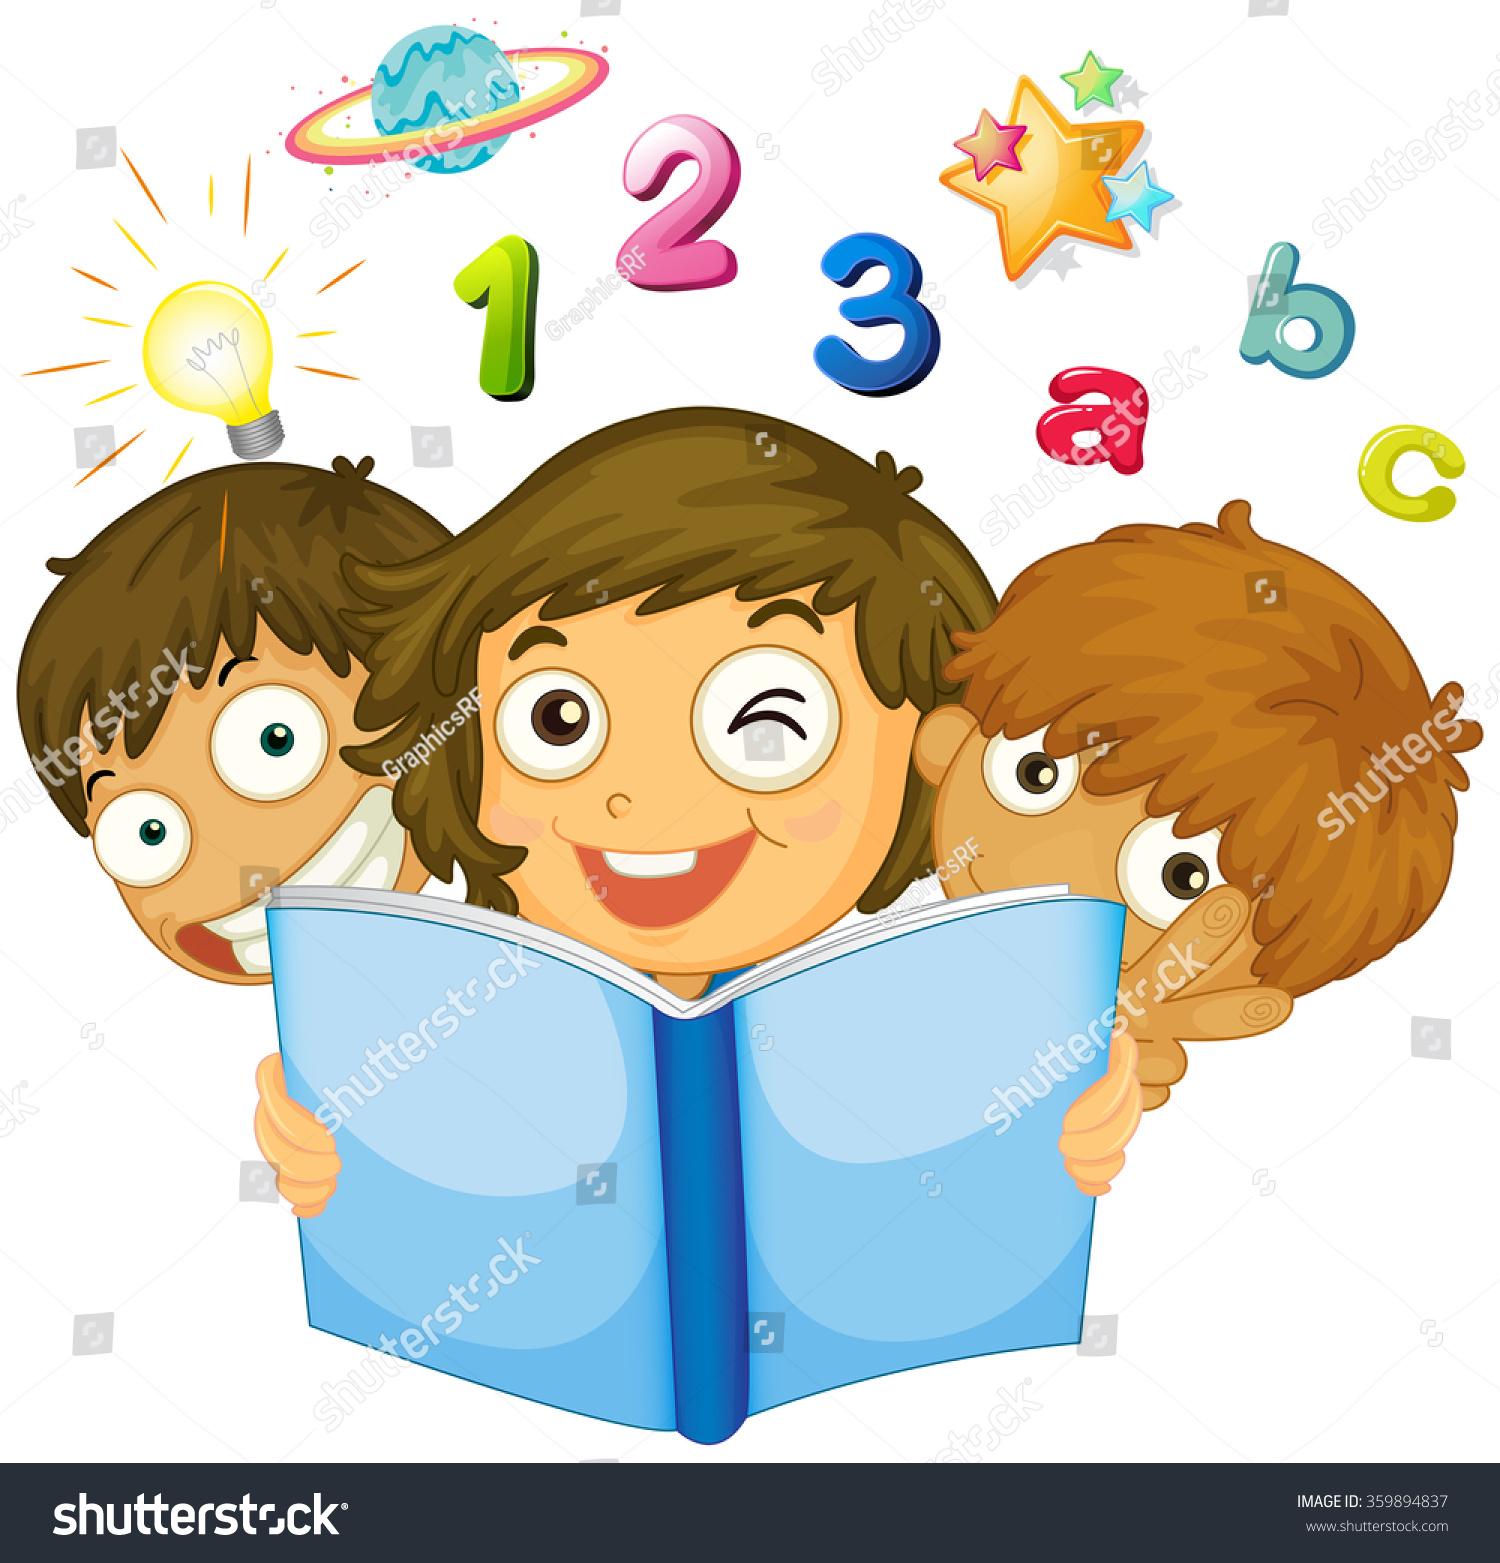 Worksheet Reading Math reading math scalien children book illustration 359894837 shutterstock